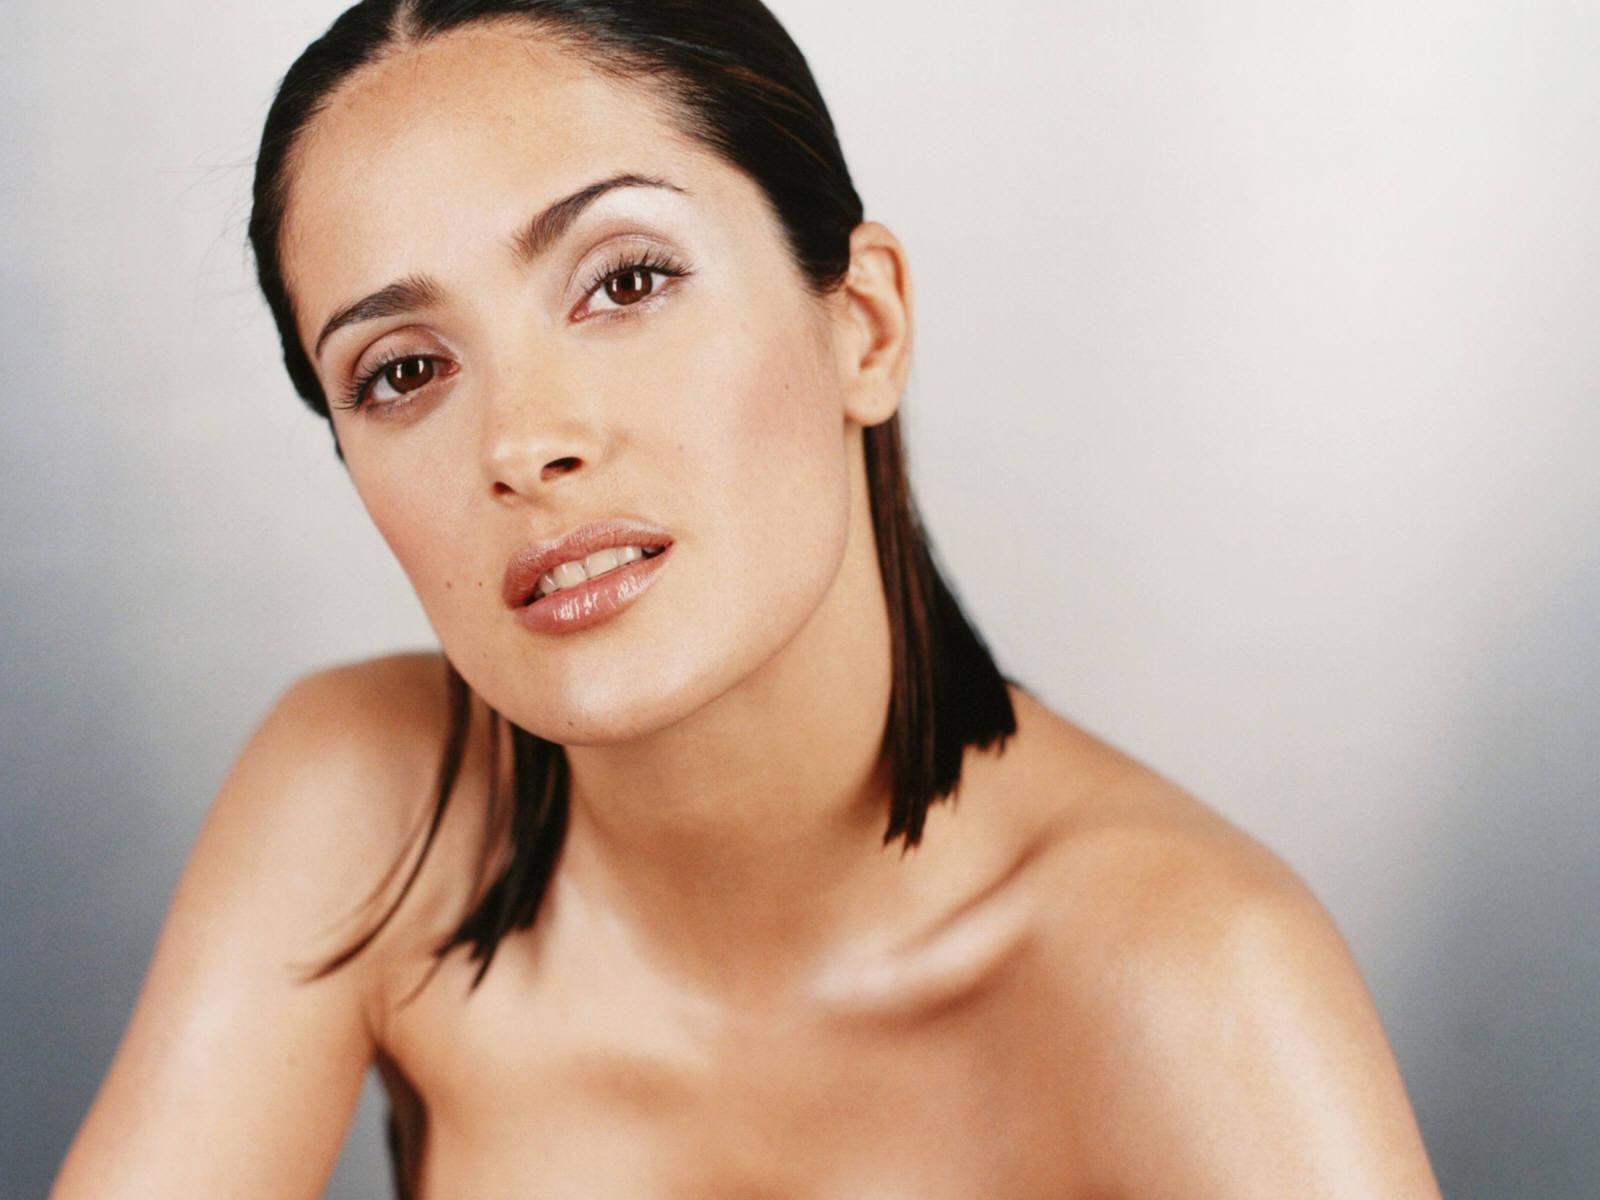 Hot Beautifull Women In Hollywood Actress Salma Hayek